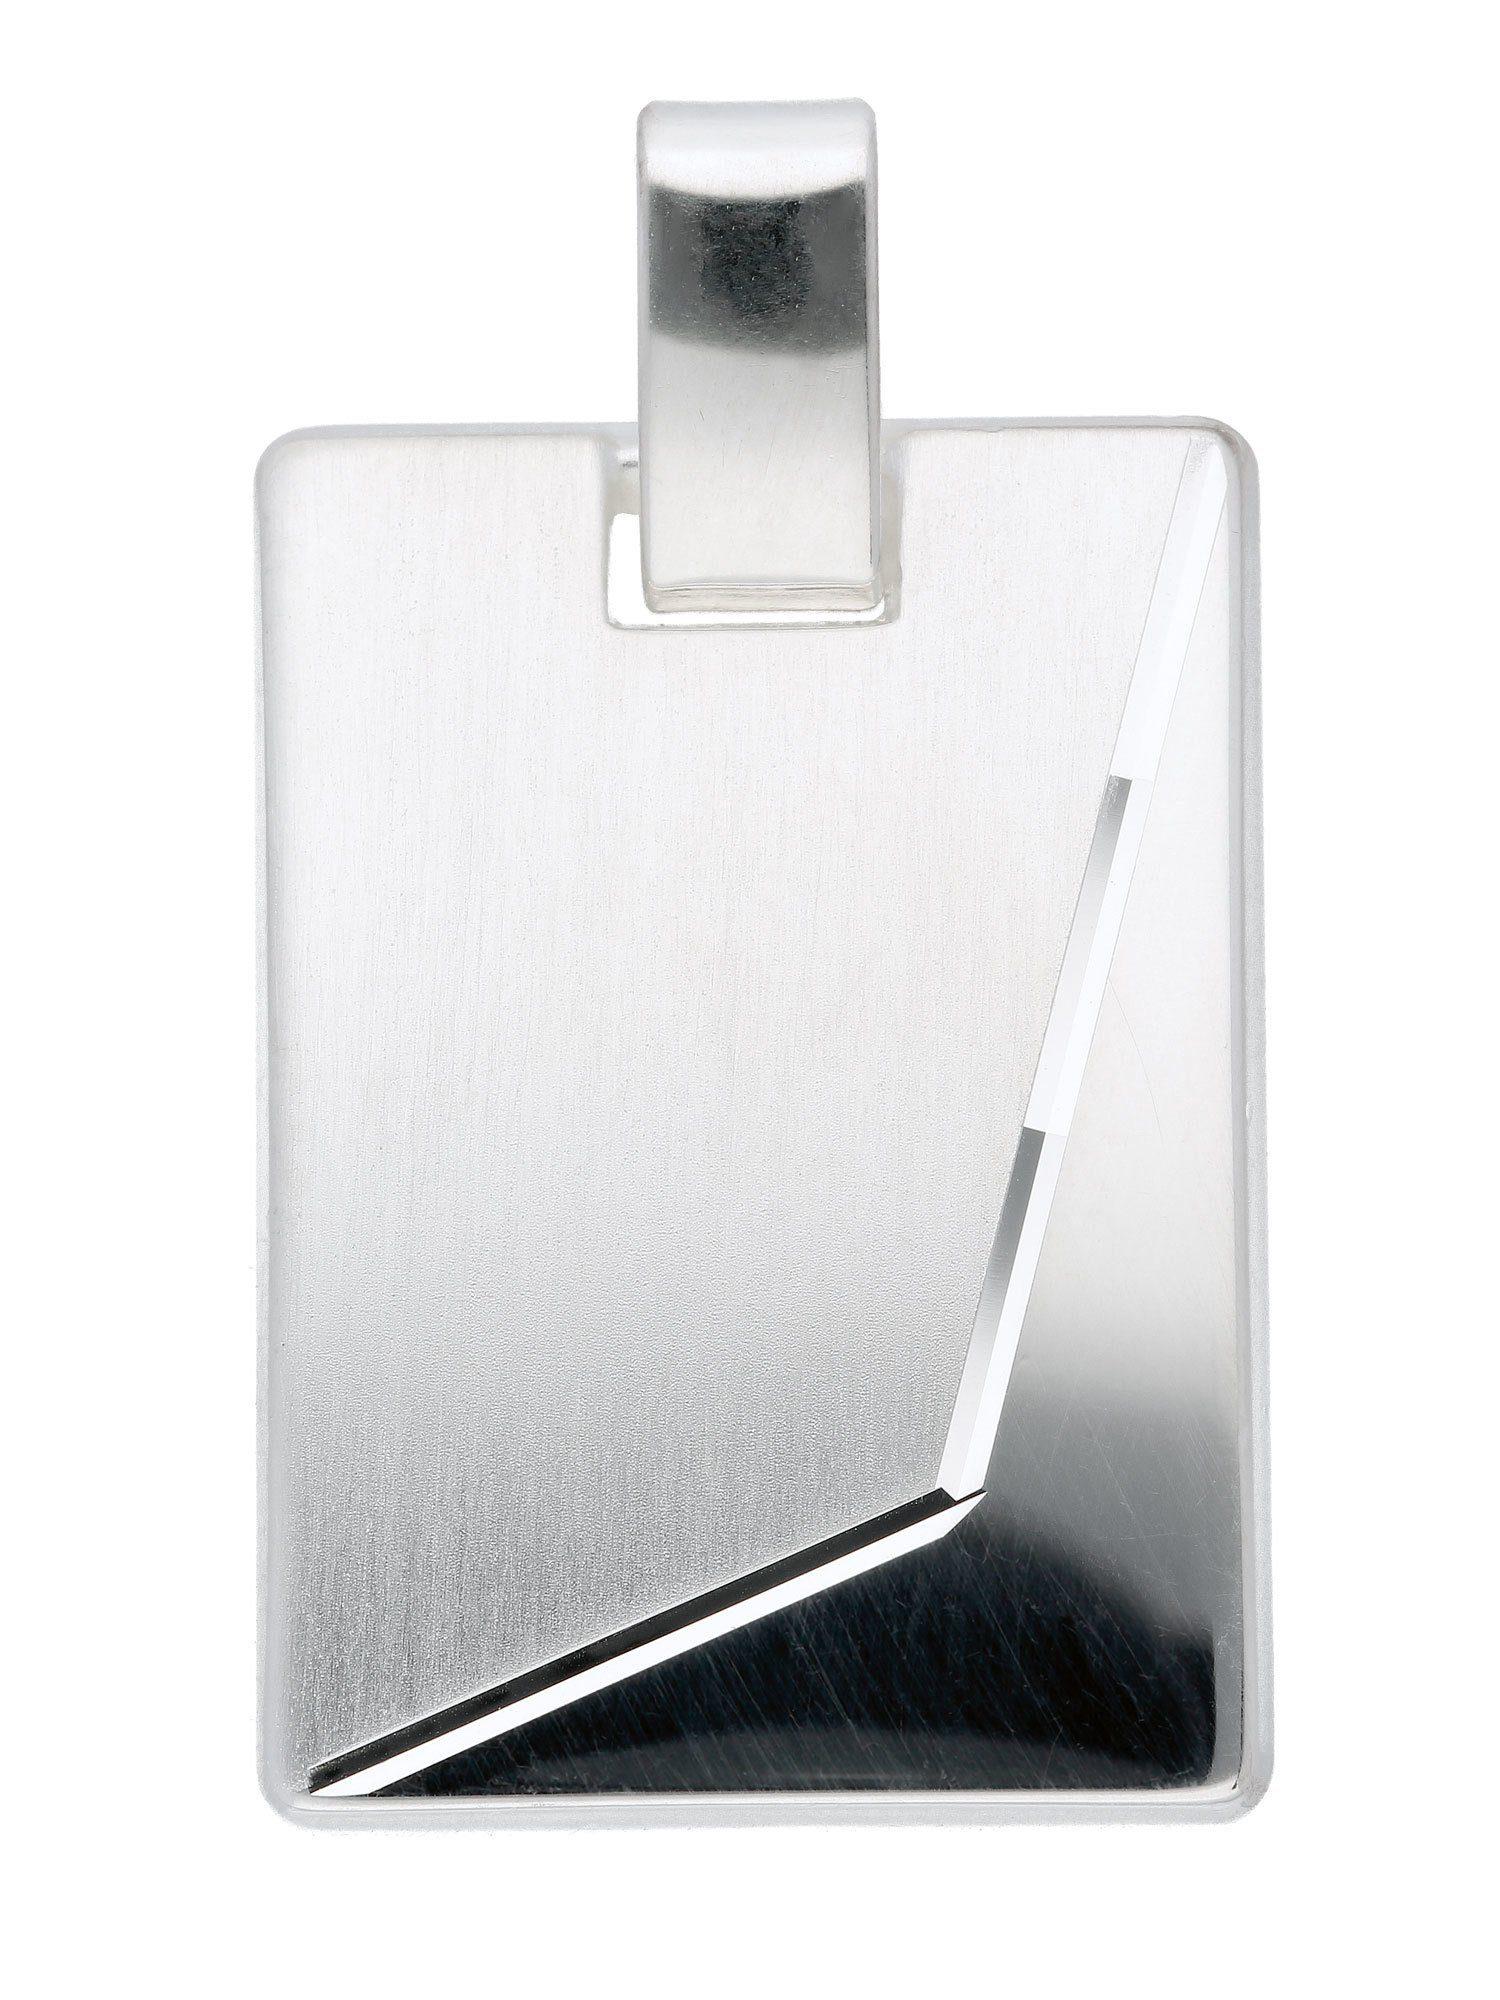 Adelia´s Kettenanhänger »Silber 925 Sterling Silver Gravurplatte« 925 Sterling Silber